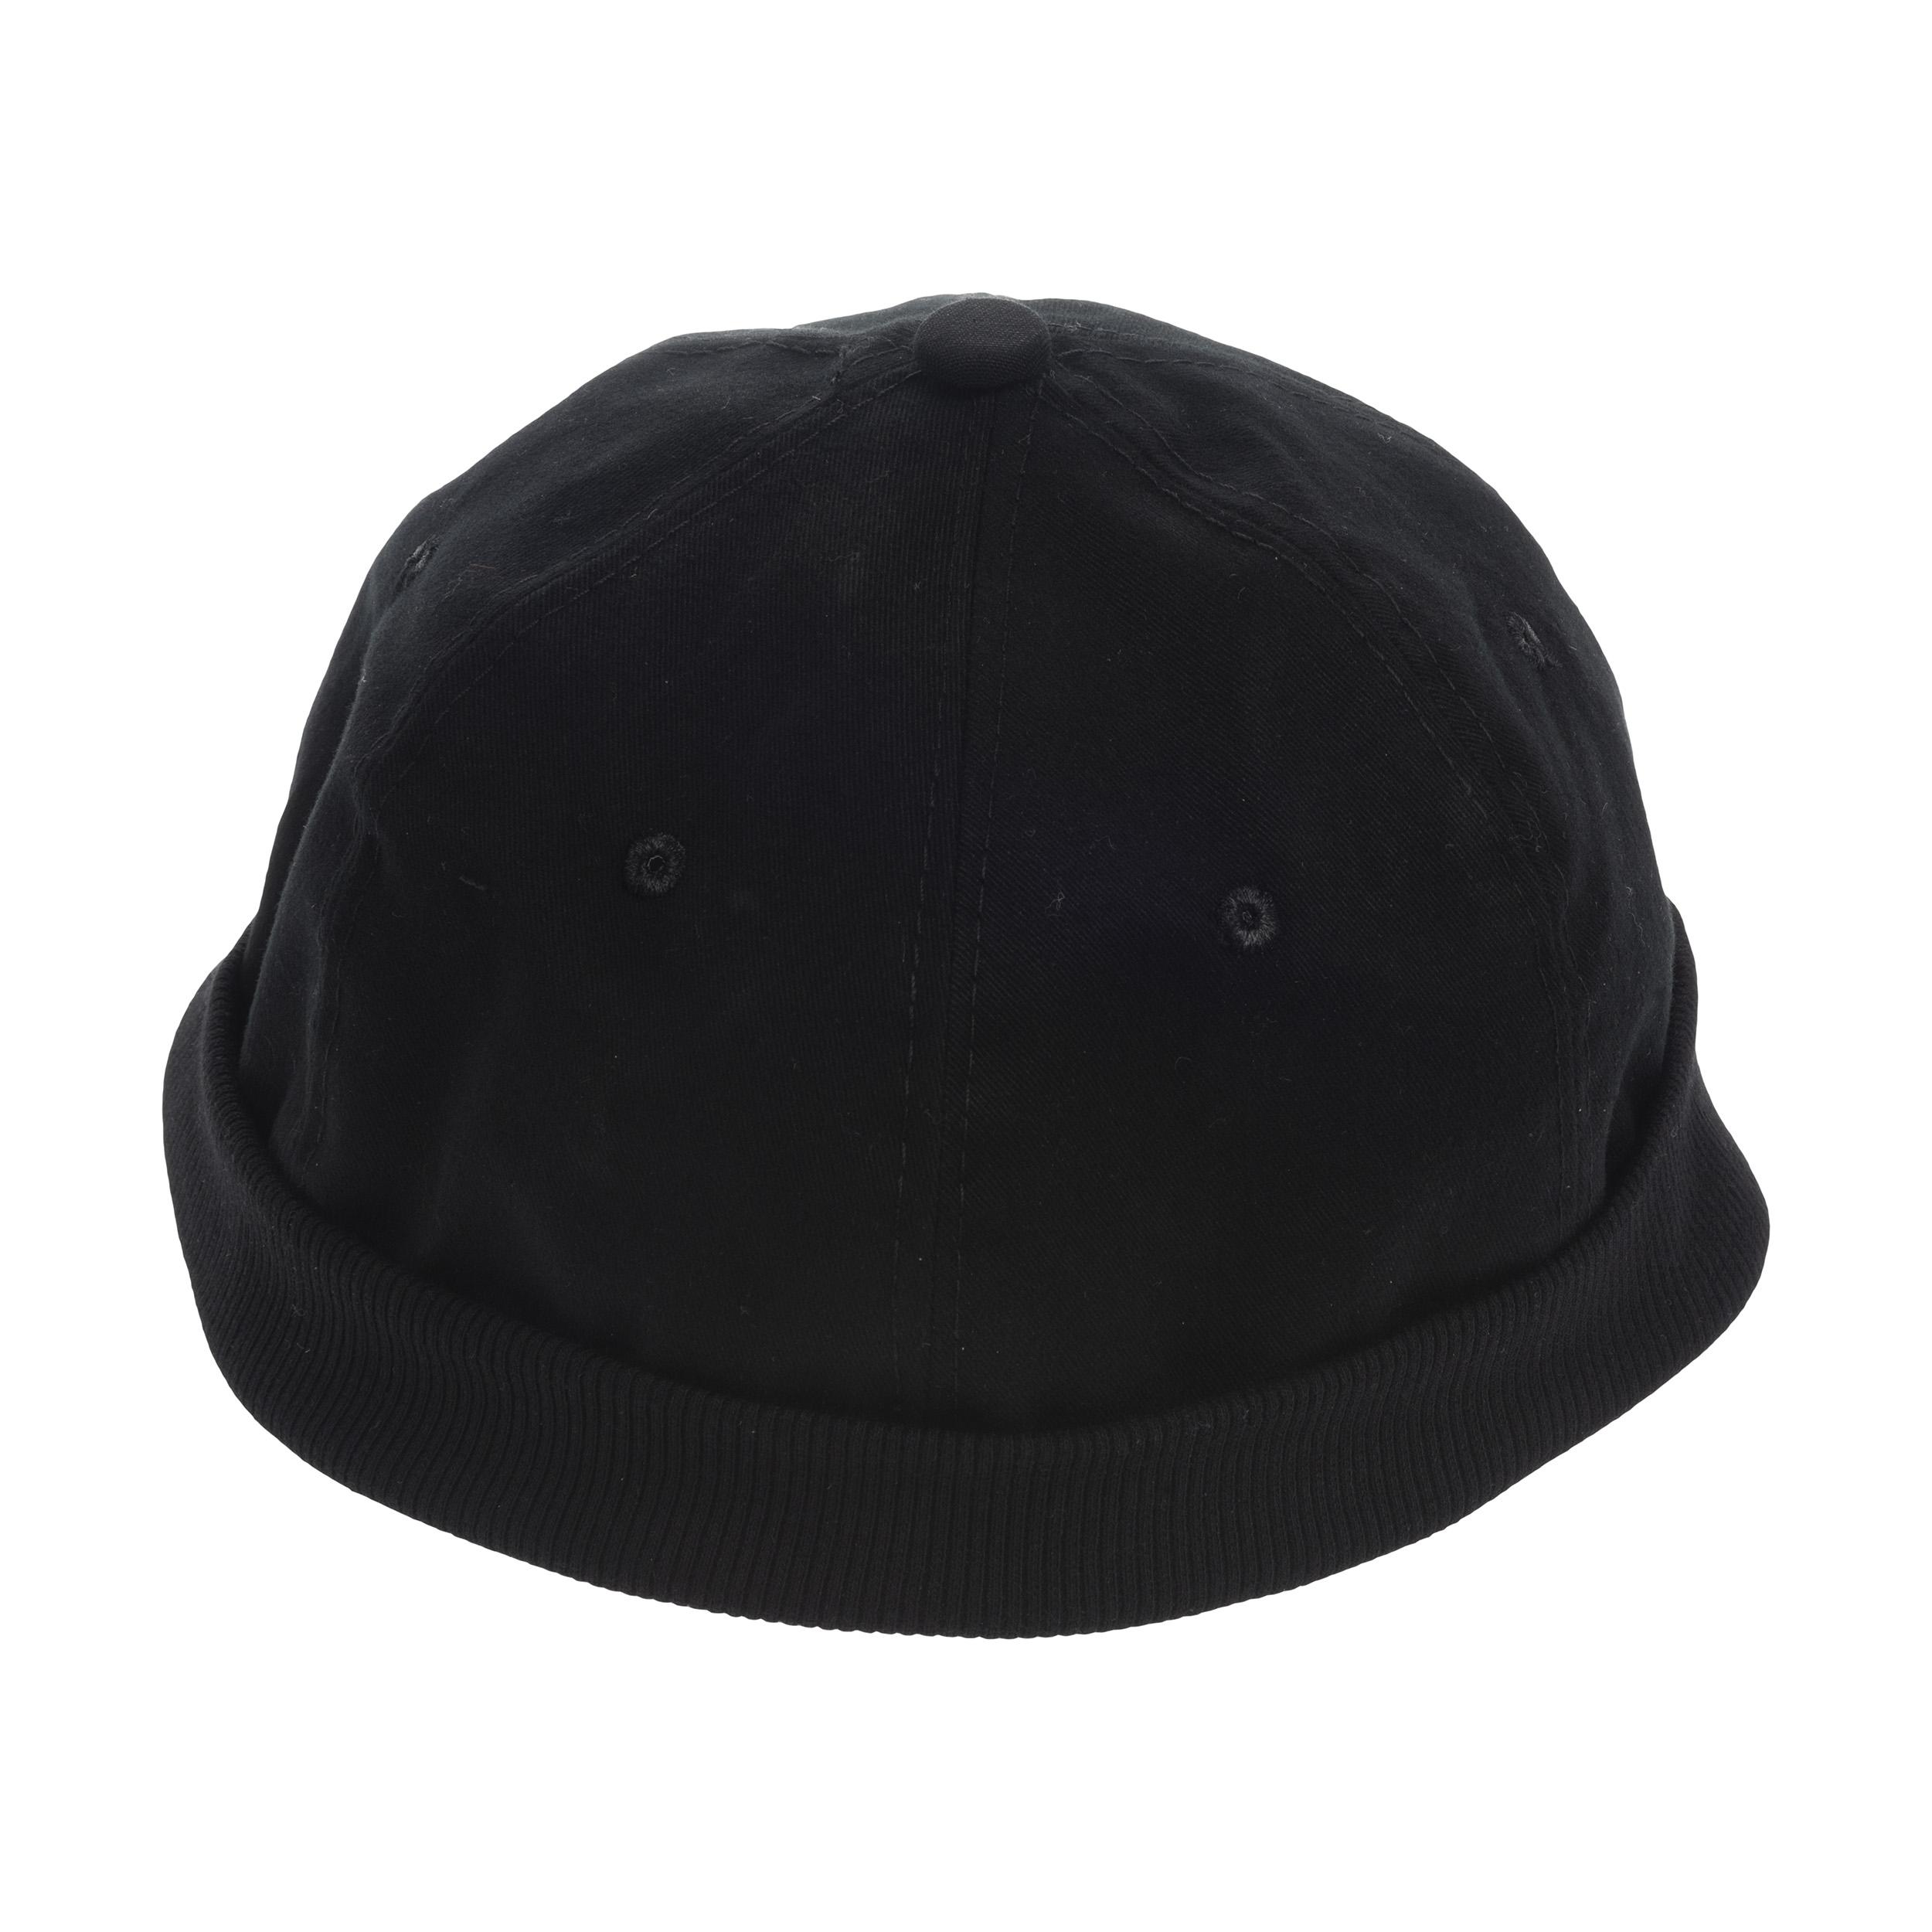 کلاه  مردانه کد 12-21